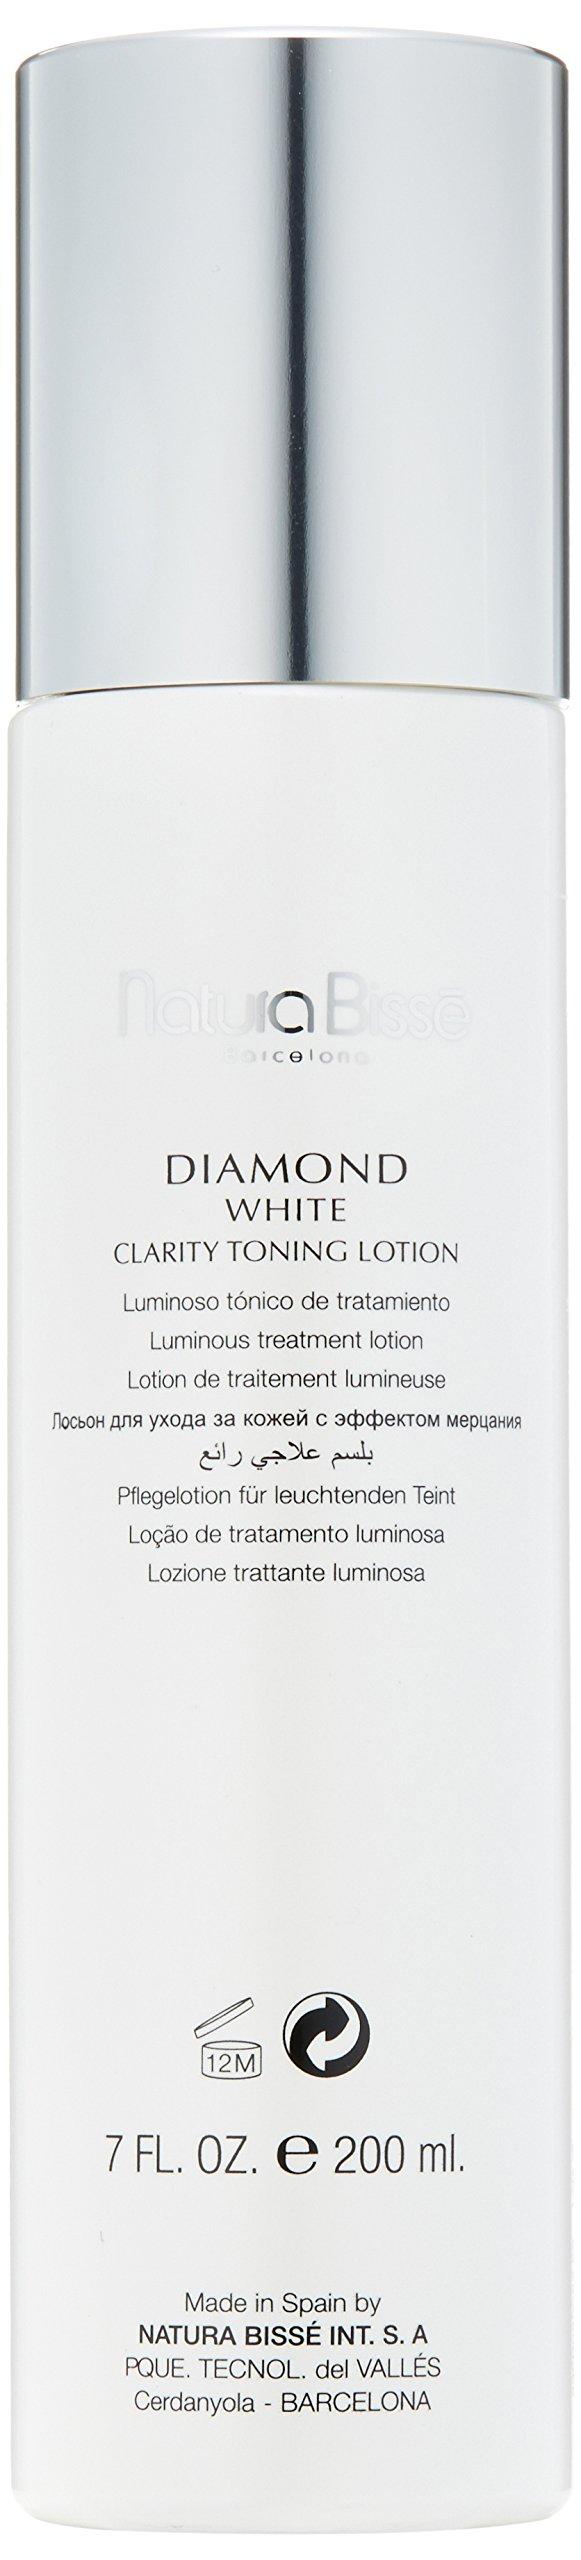 Natura Bisse Diamond White Clarity Toning Lotion, 7.0 fl. oz. by Natura Bisse (Image #5)